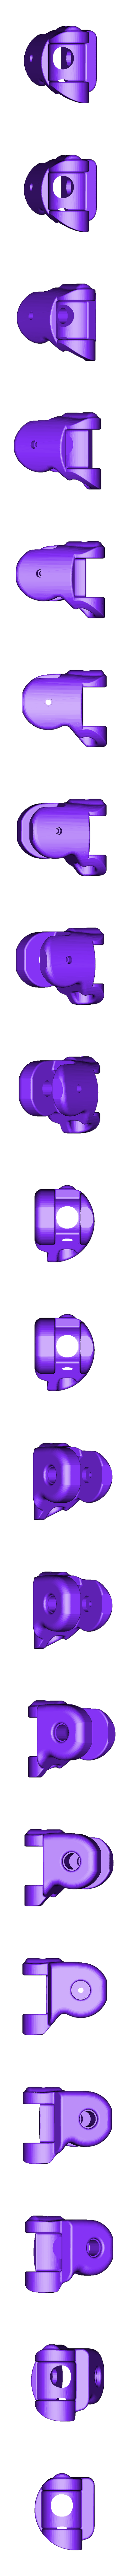 charni%C3%A8re_doigt_dessus_index__.stl Download free STL file Articulated hand • 3D printer model, NOP21